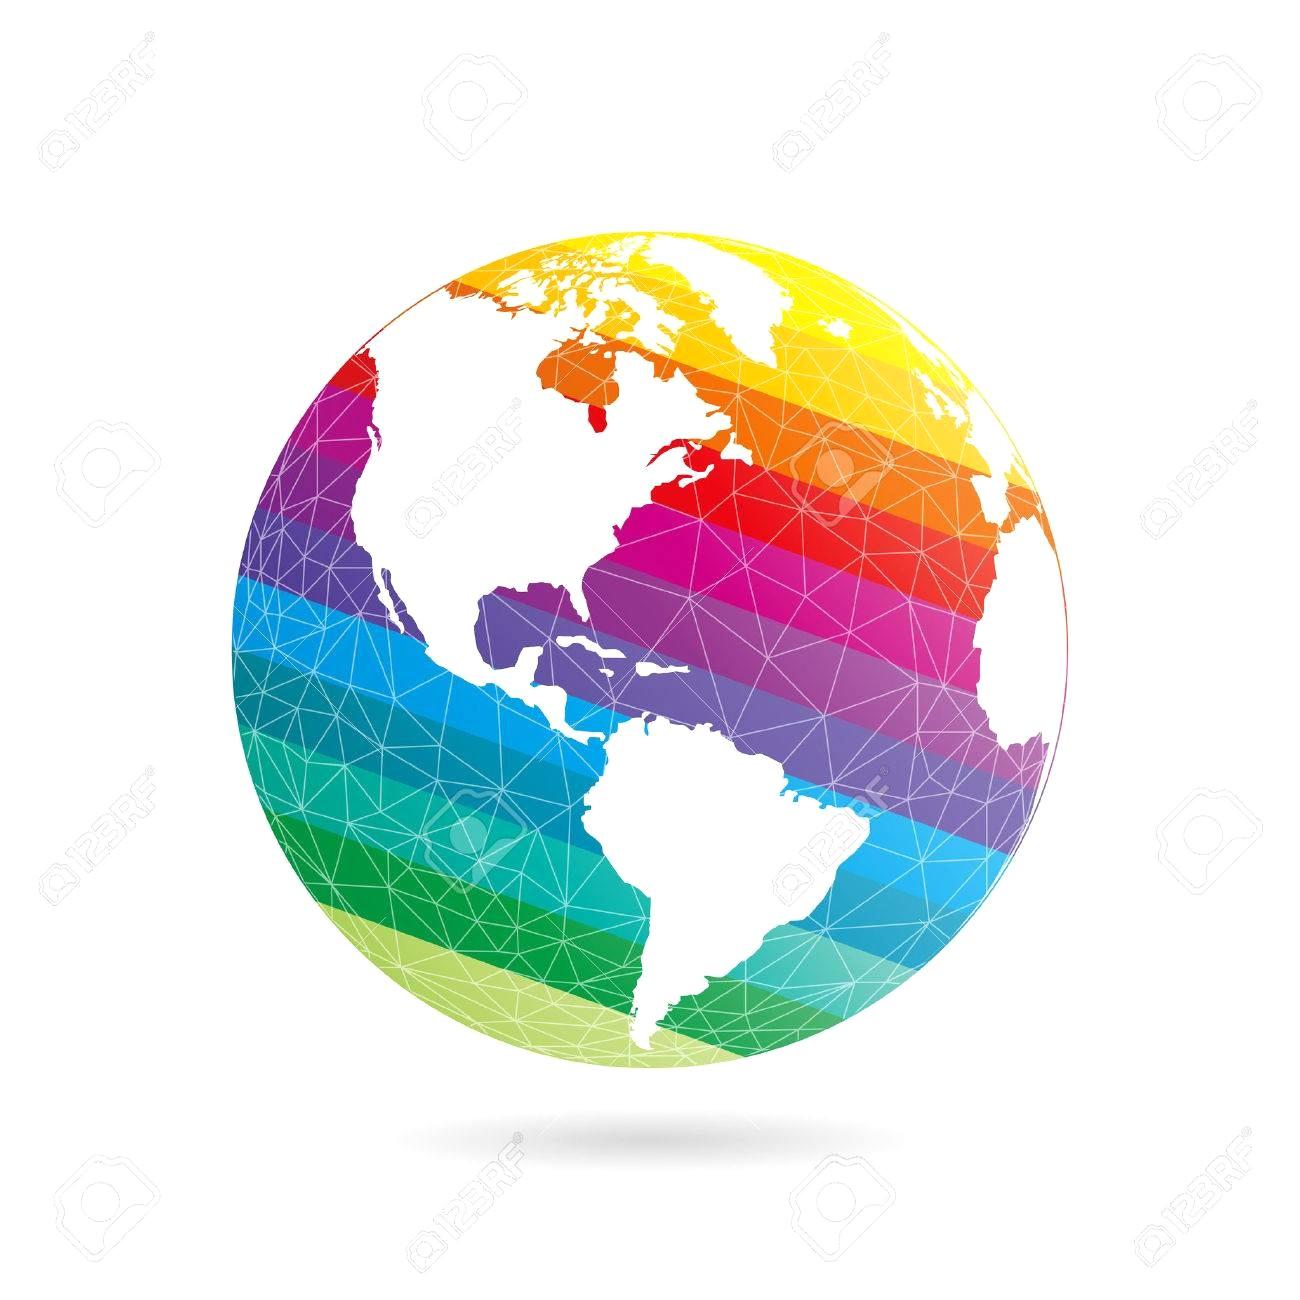 1300x1300 Globe Earth Planet Graphic Vector 15770404 16